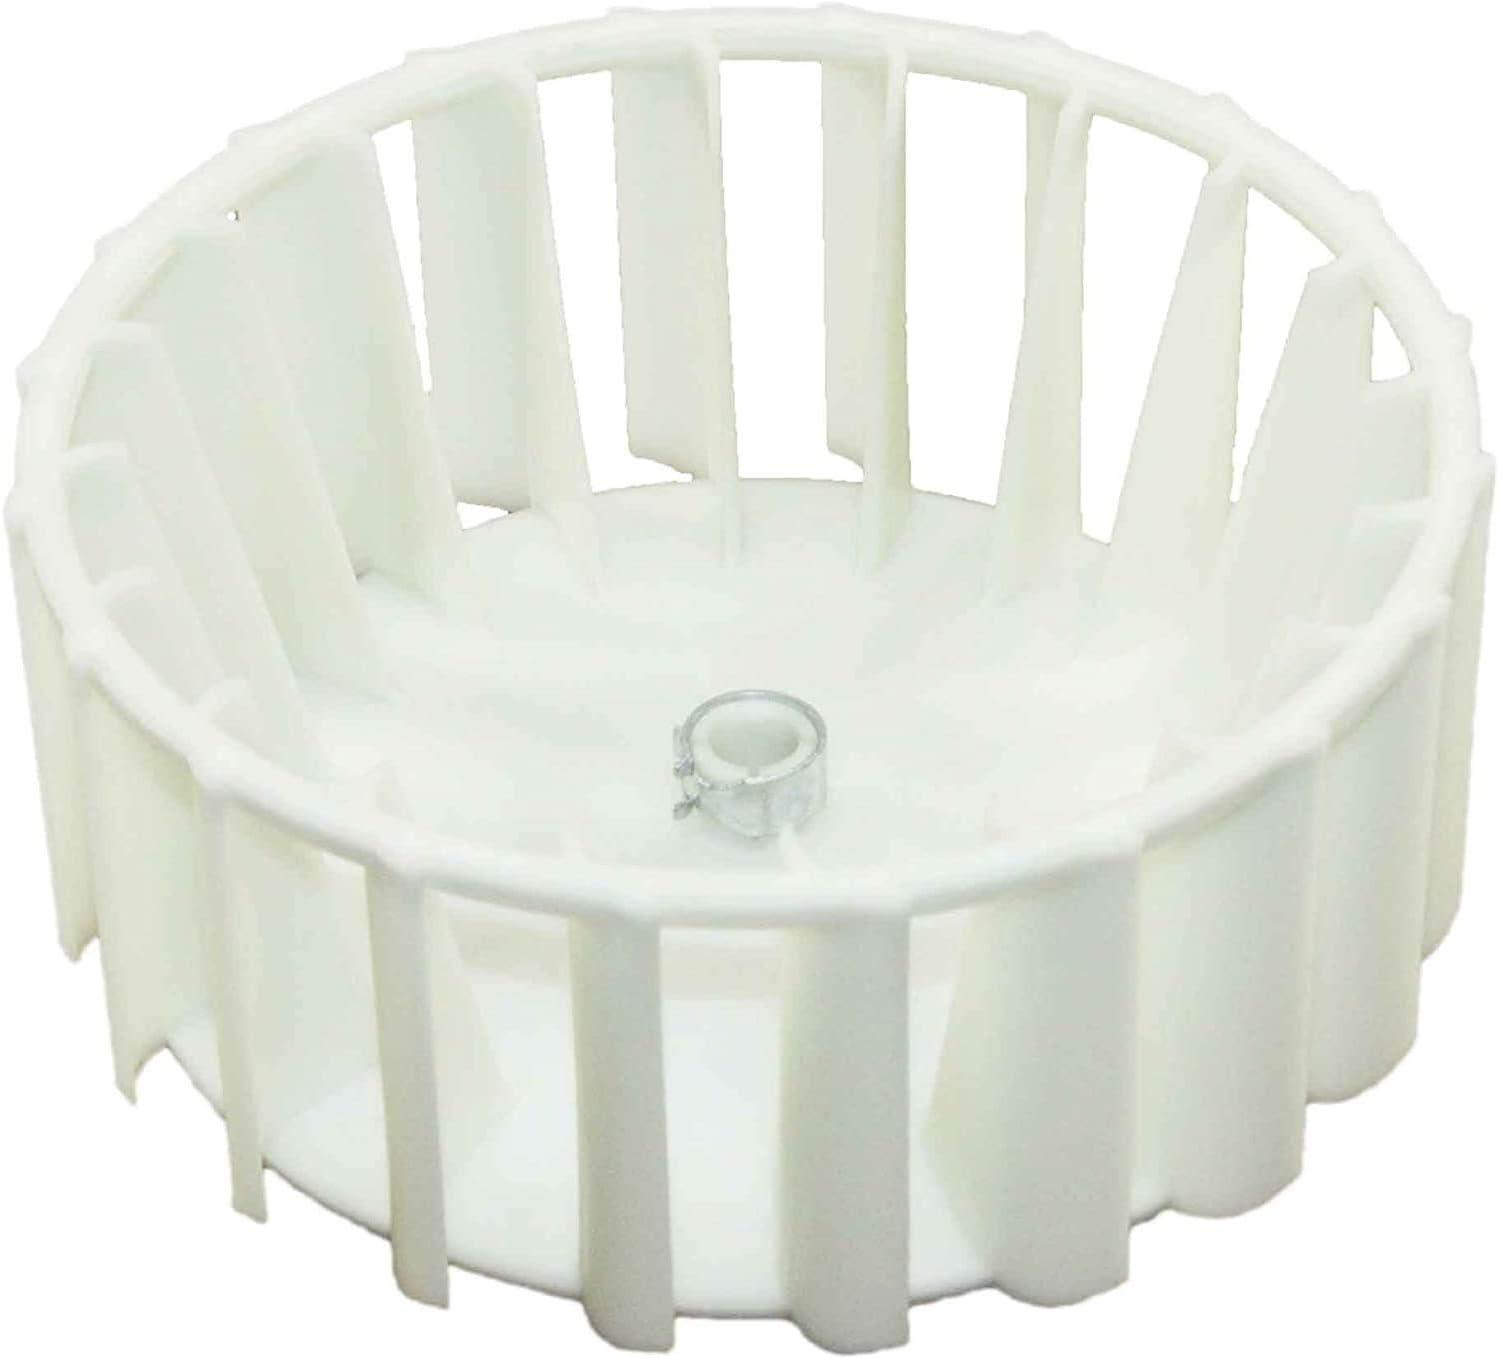 303836 Maytag Dryer Blower Wheel for Whirlpool